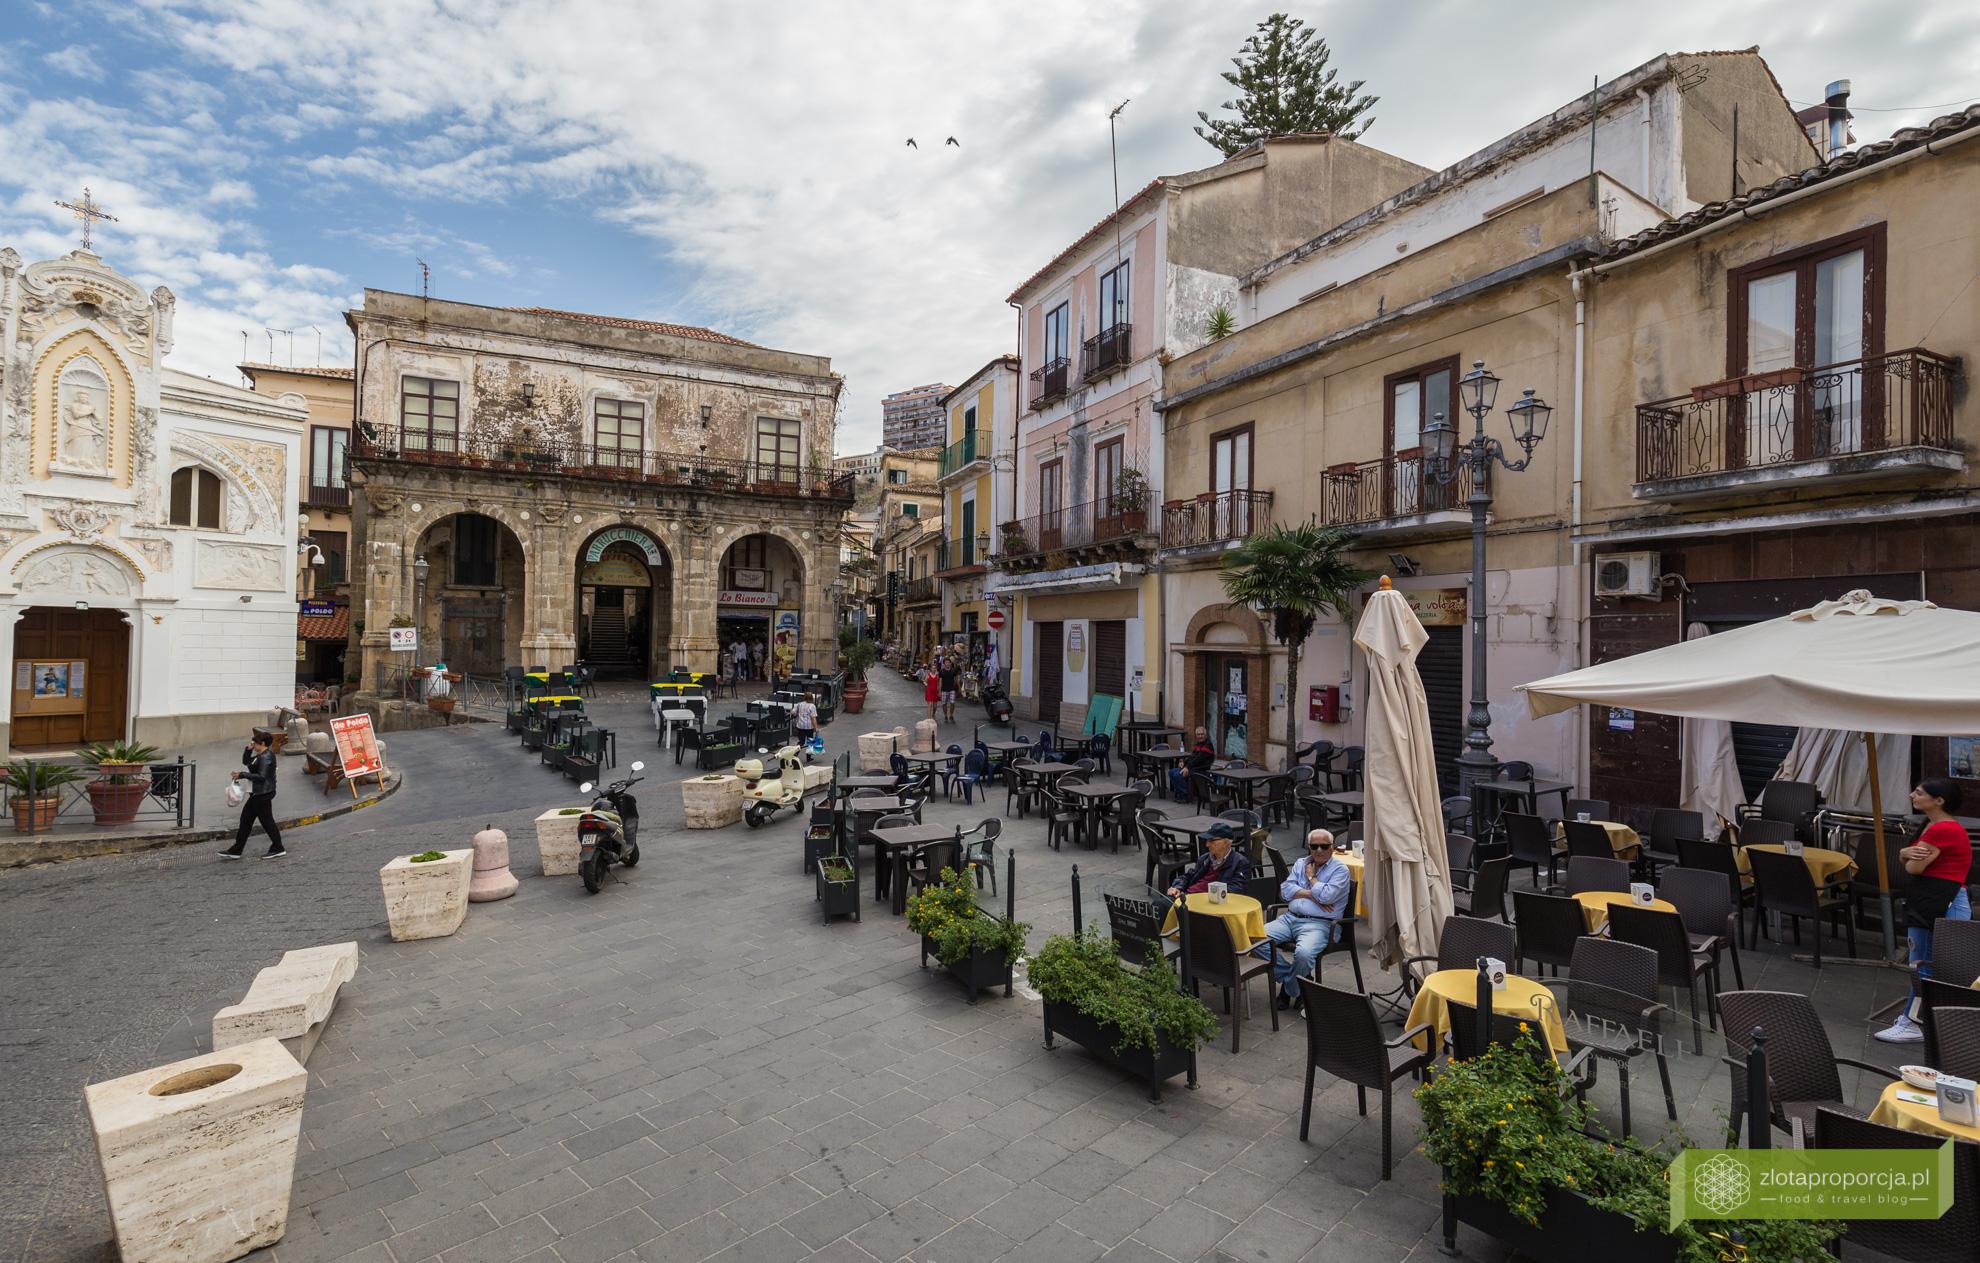 Pizzo, Kalabria, atrakcje Kalabrii, Kalabria zdjęcia